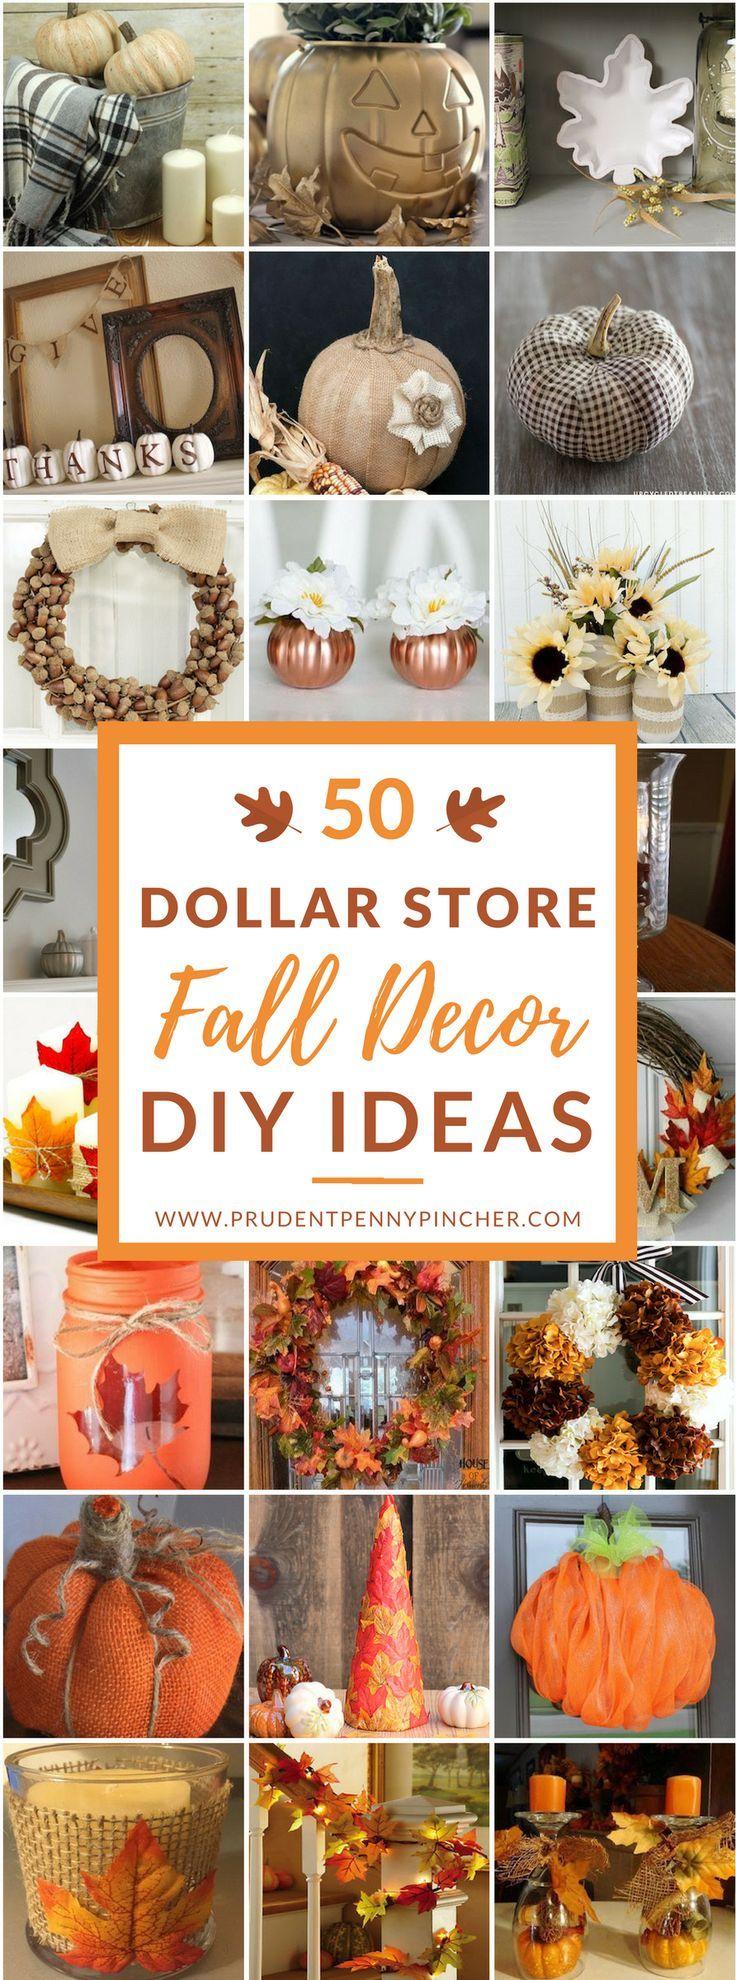 501 decorating ideas under 100 - Awesome 50 Dollar Store Fall Decor Diy Ideas